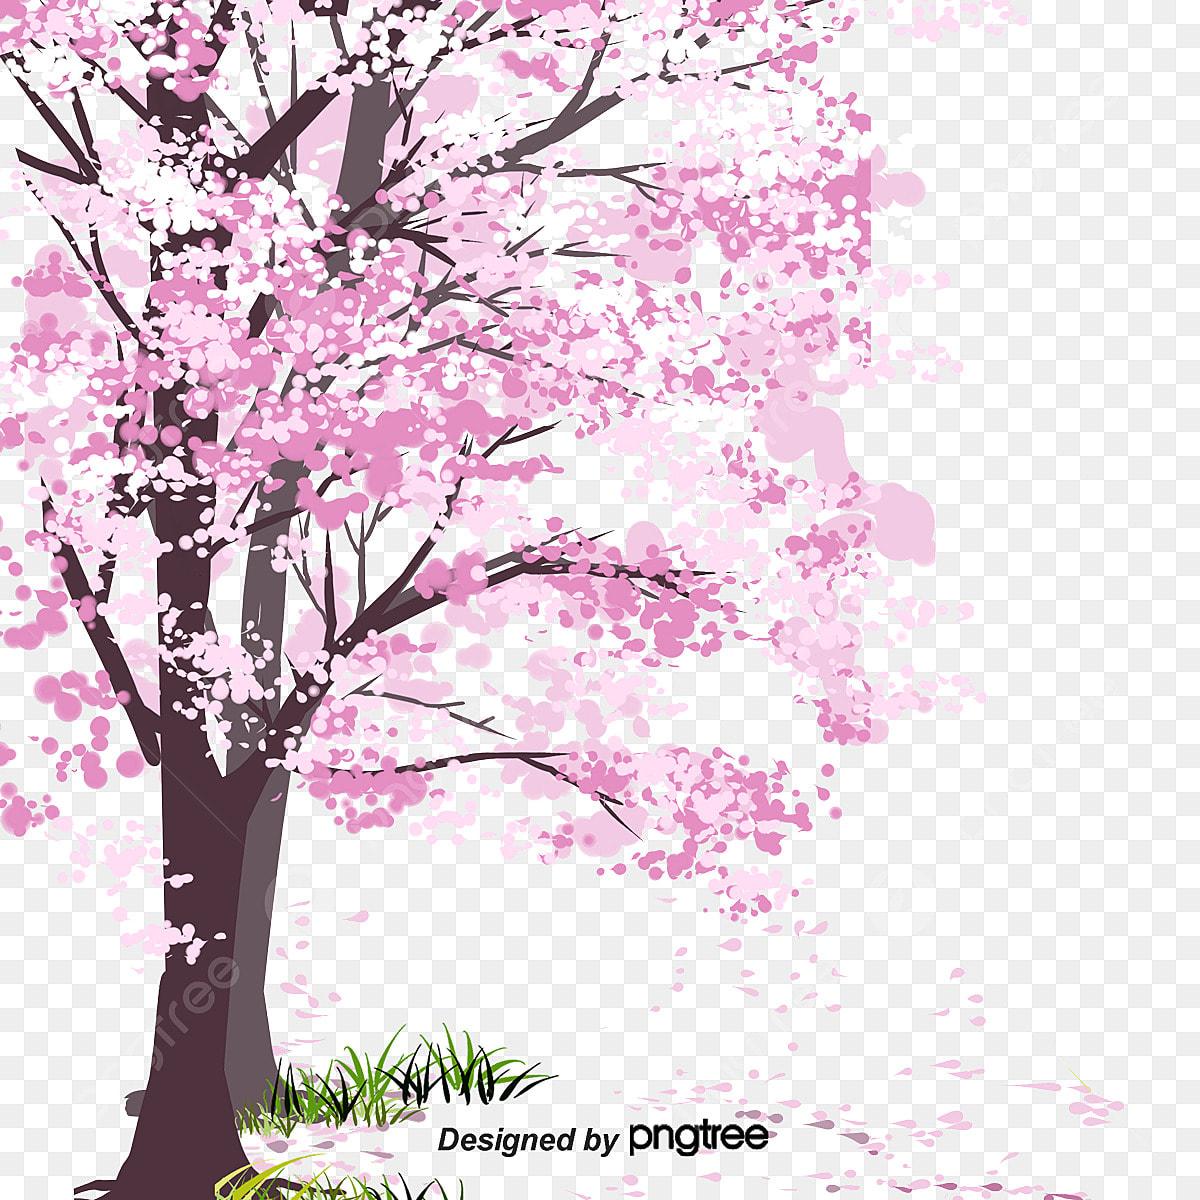 Pink Musim Bunga Sakura Mekar Kartun Jepun Romantis Bahan Kartun